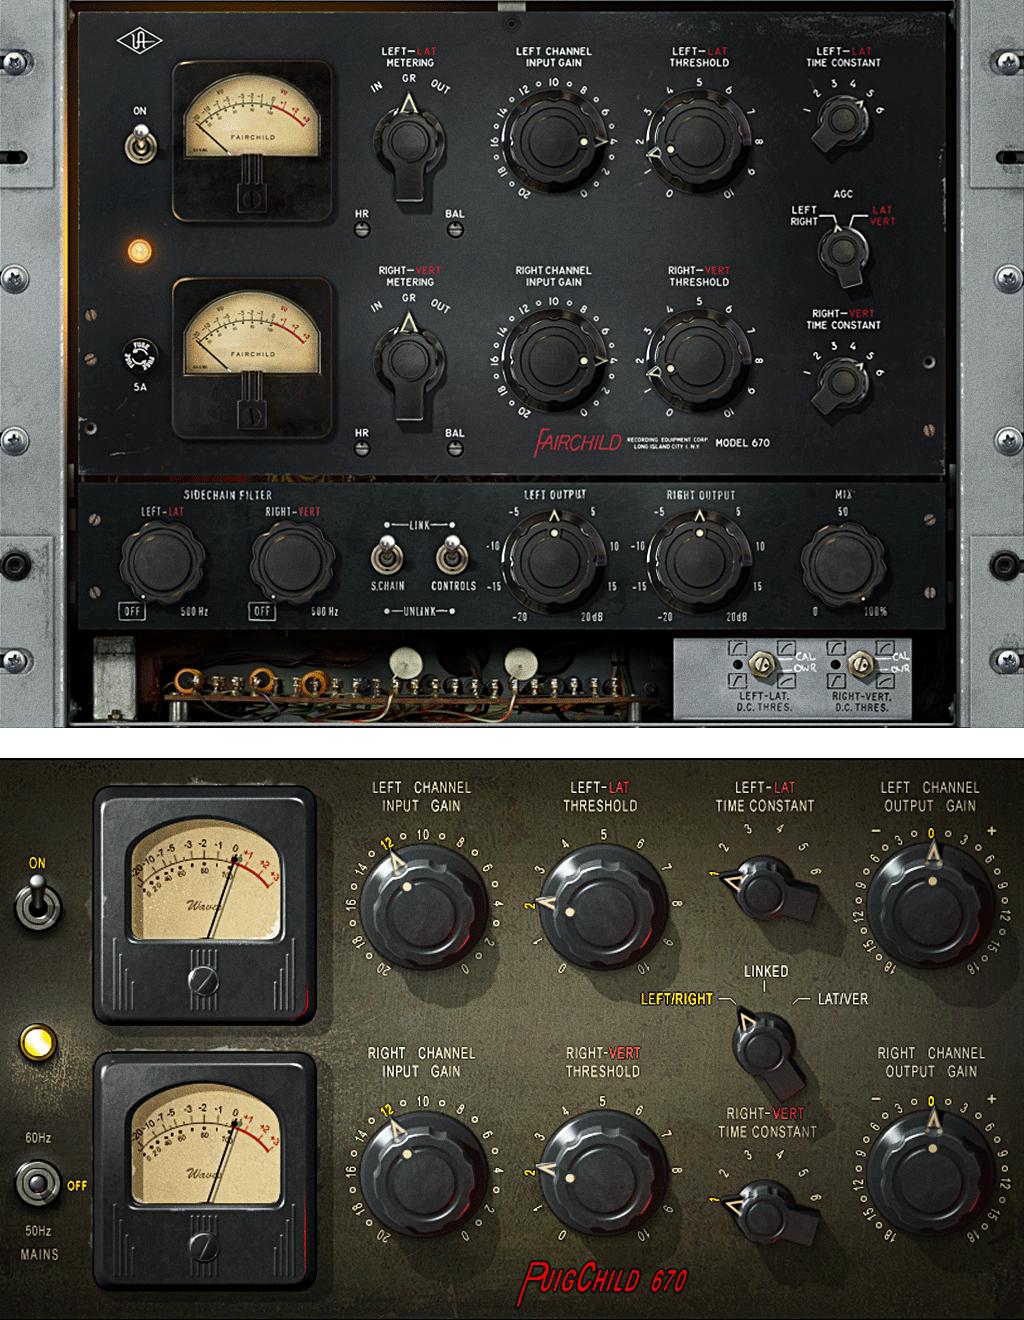 Fairchild670のUniversal Audio版とWaves版